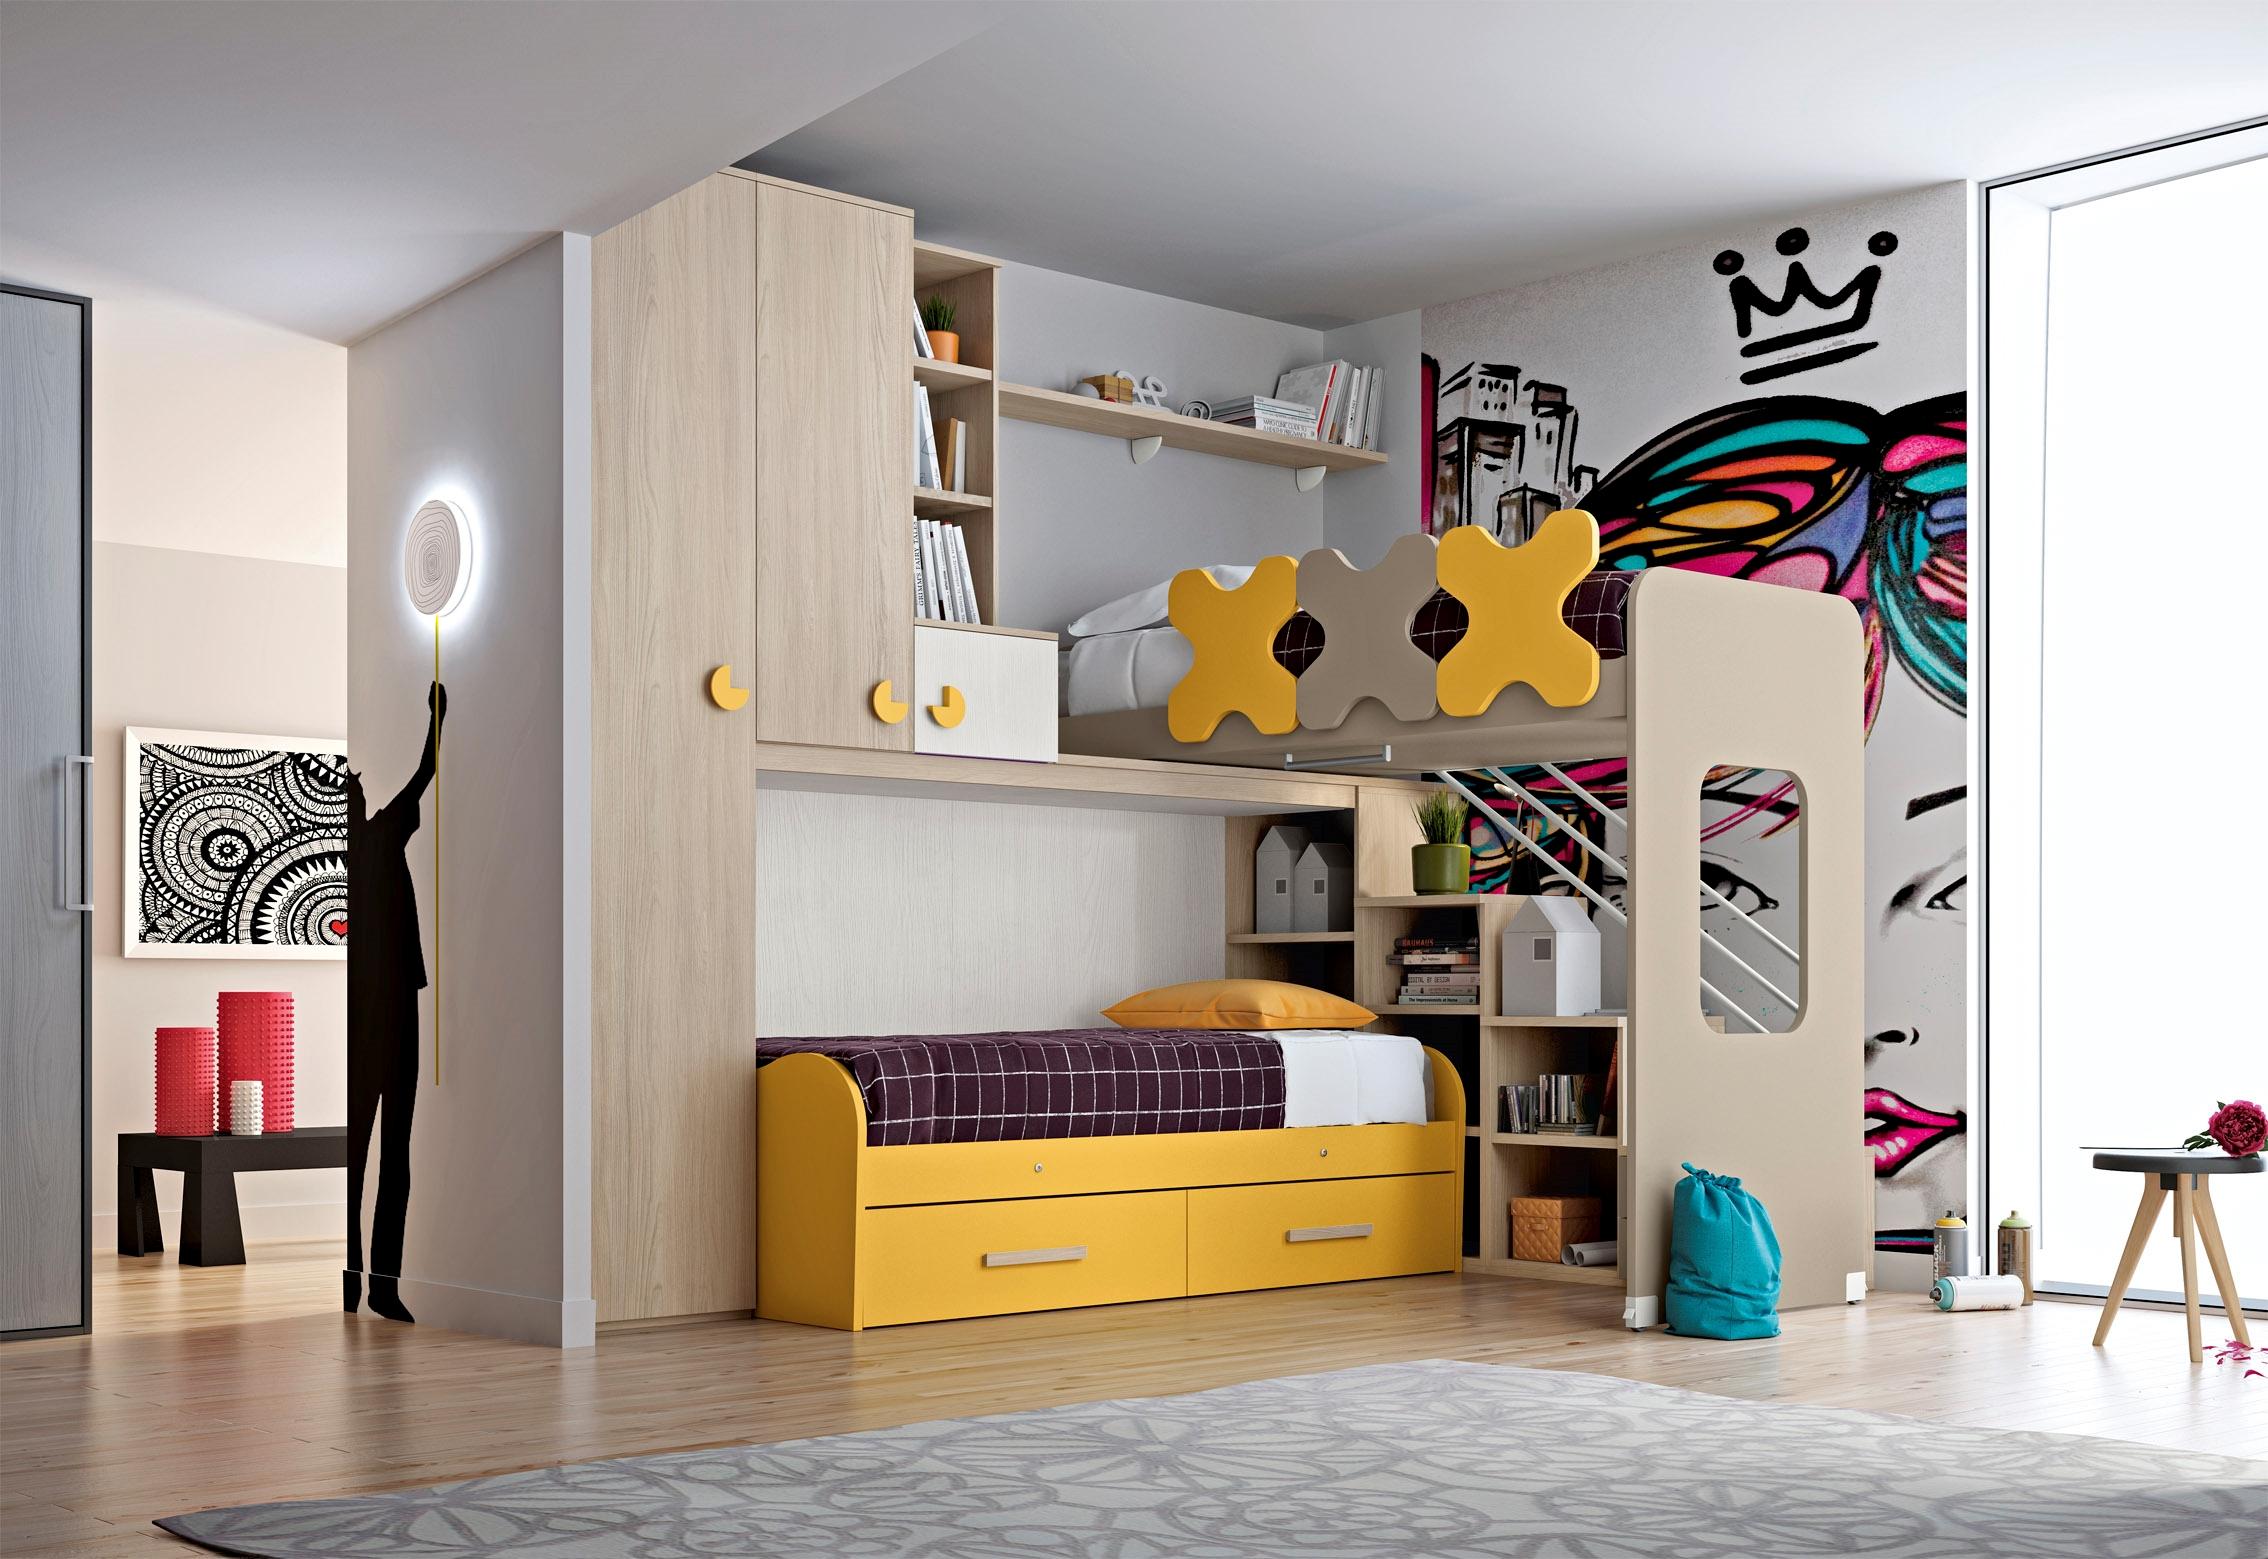 Cameretta per ragazzi scontata camerette a prezzi scontati - Camerette per stanze piccole ...